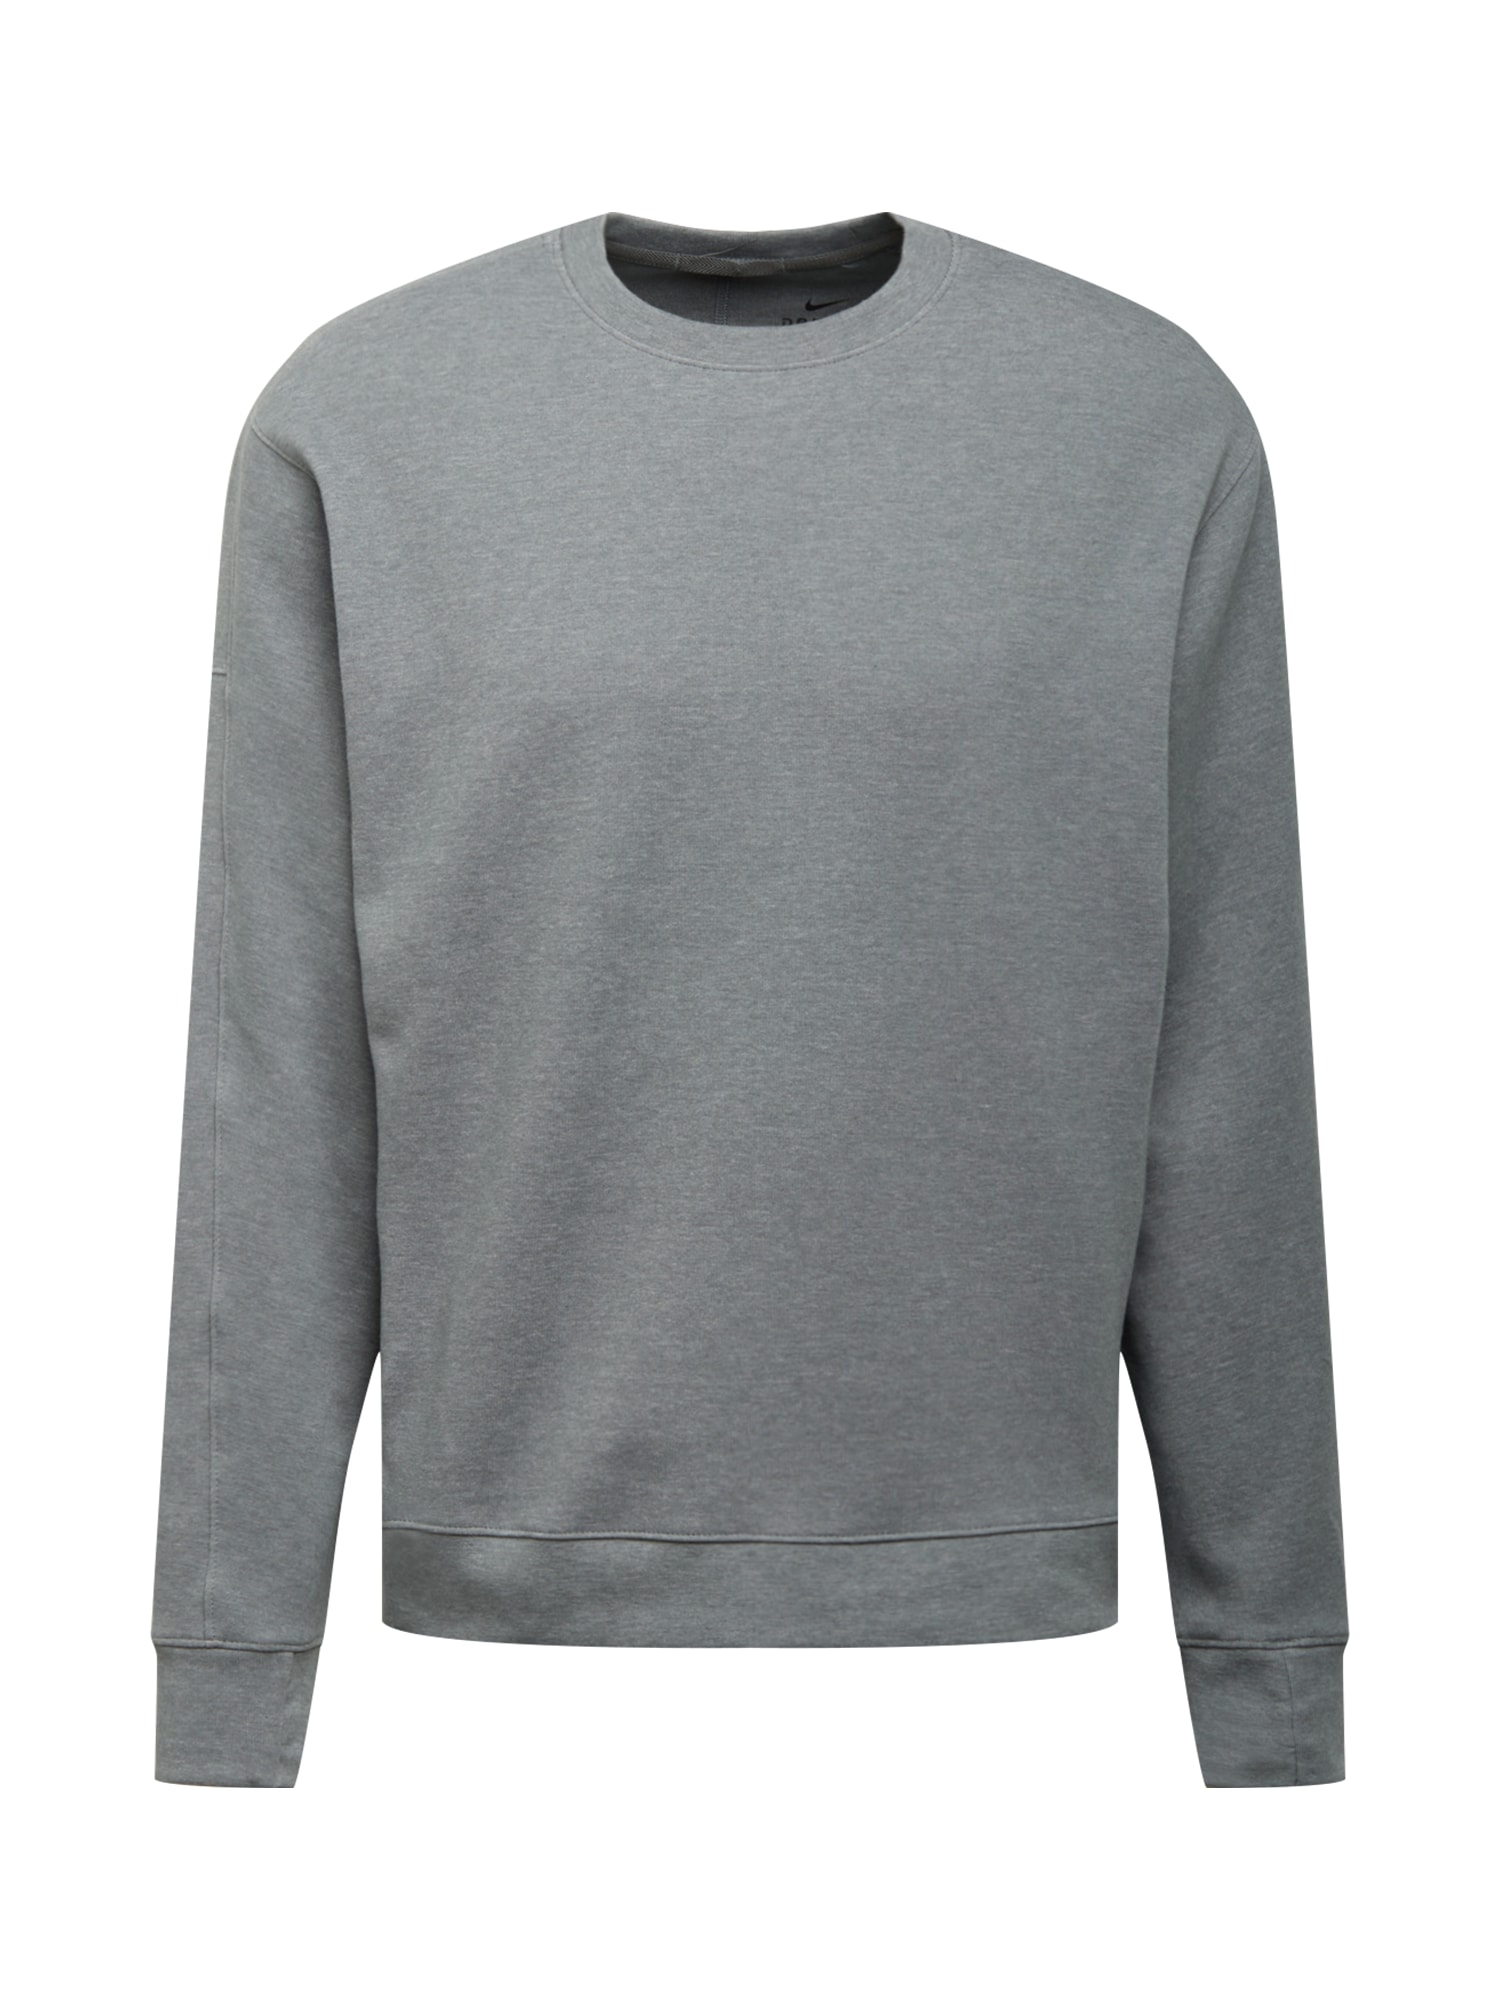 NIKE Sportinio tipo megztinis margai pilka / juoda